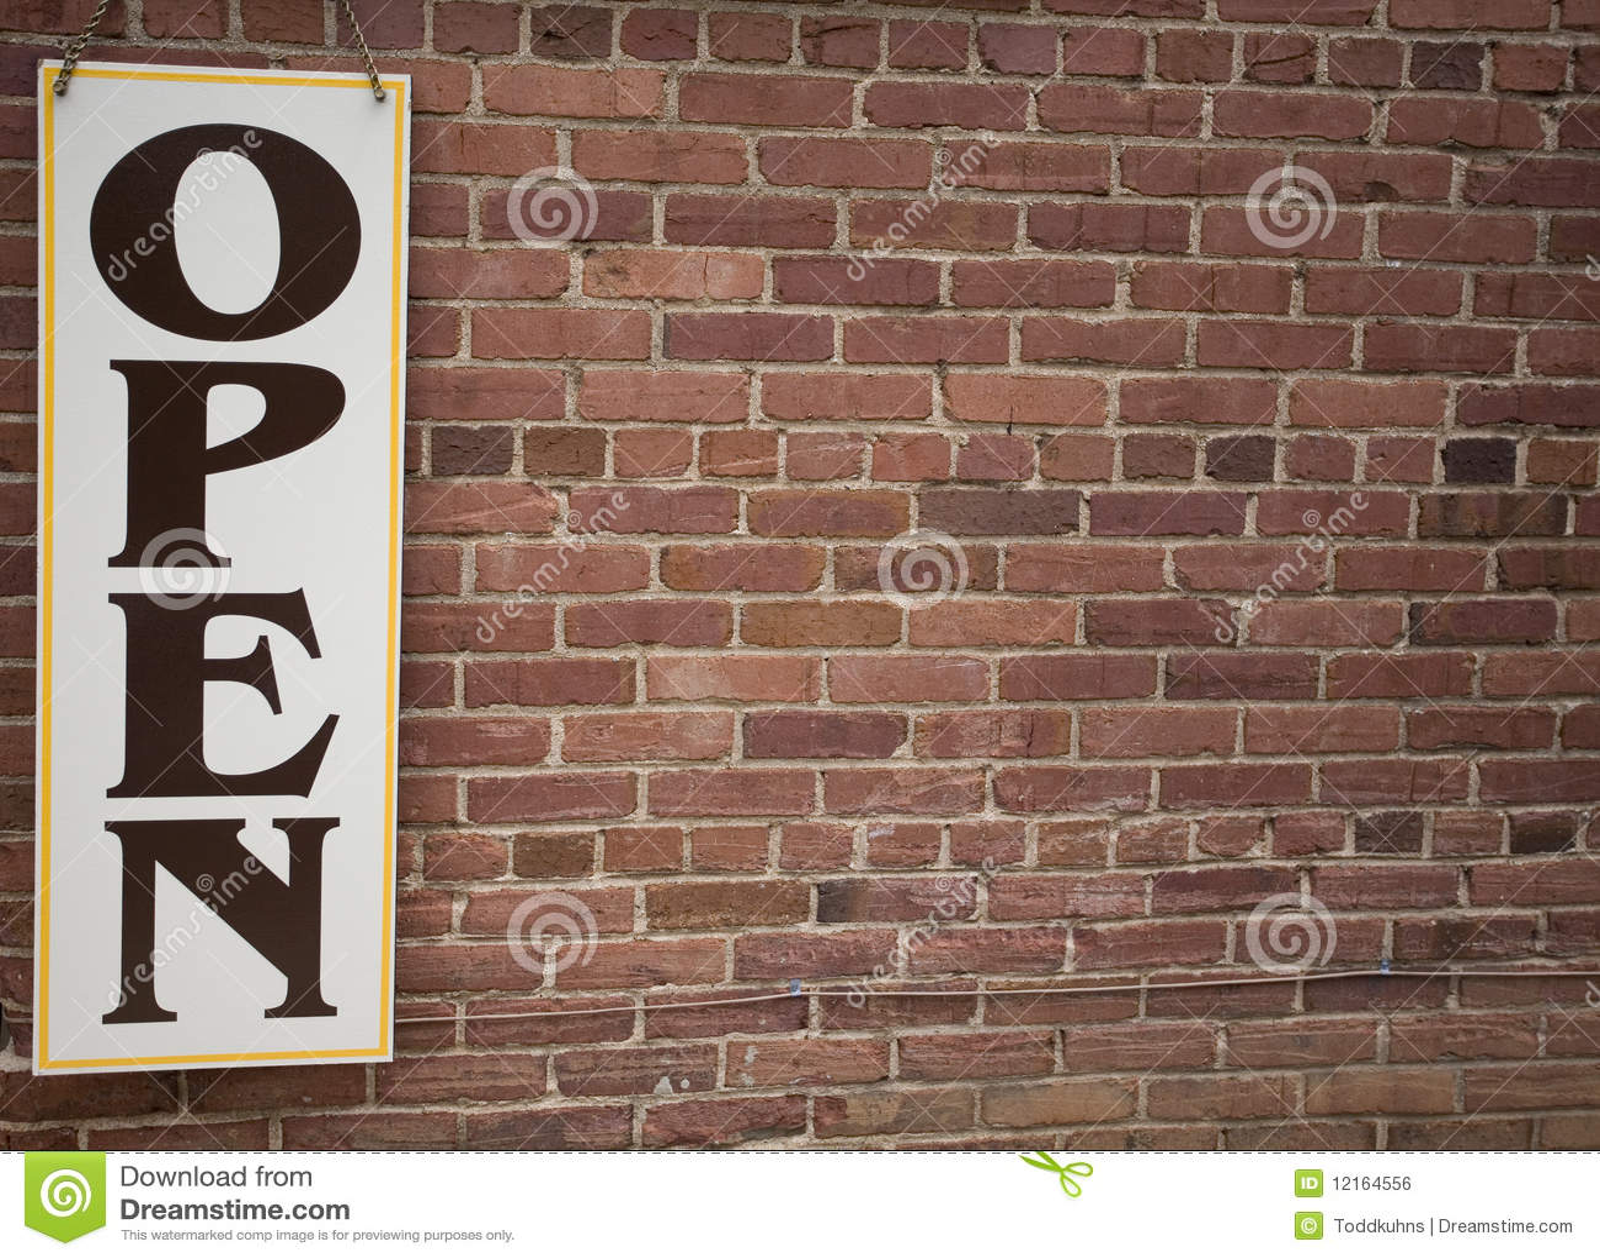 Residential Entrance Signage